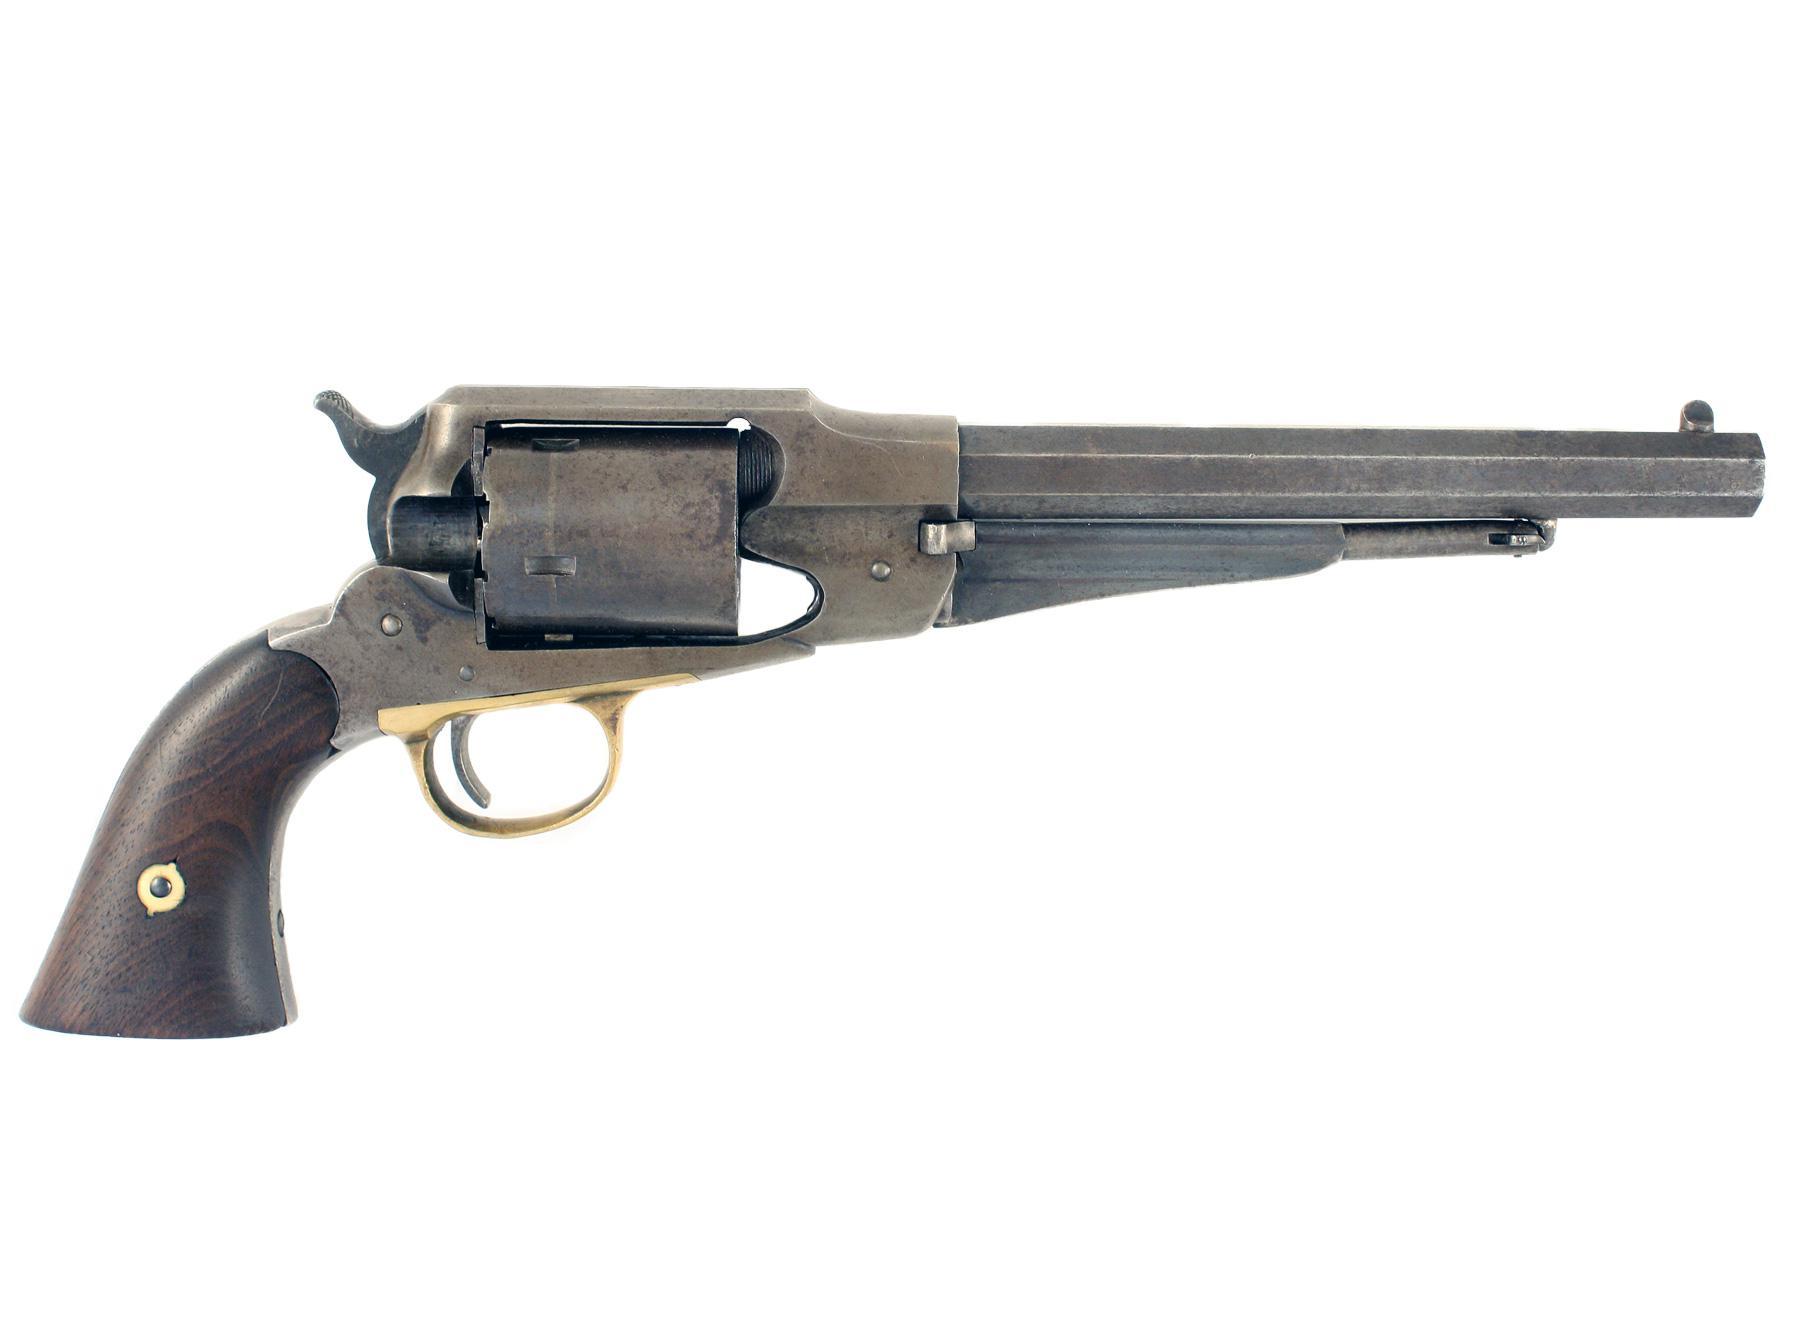 A Remington Rim-Fire Conversion